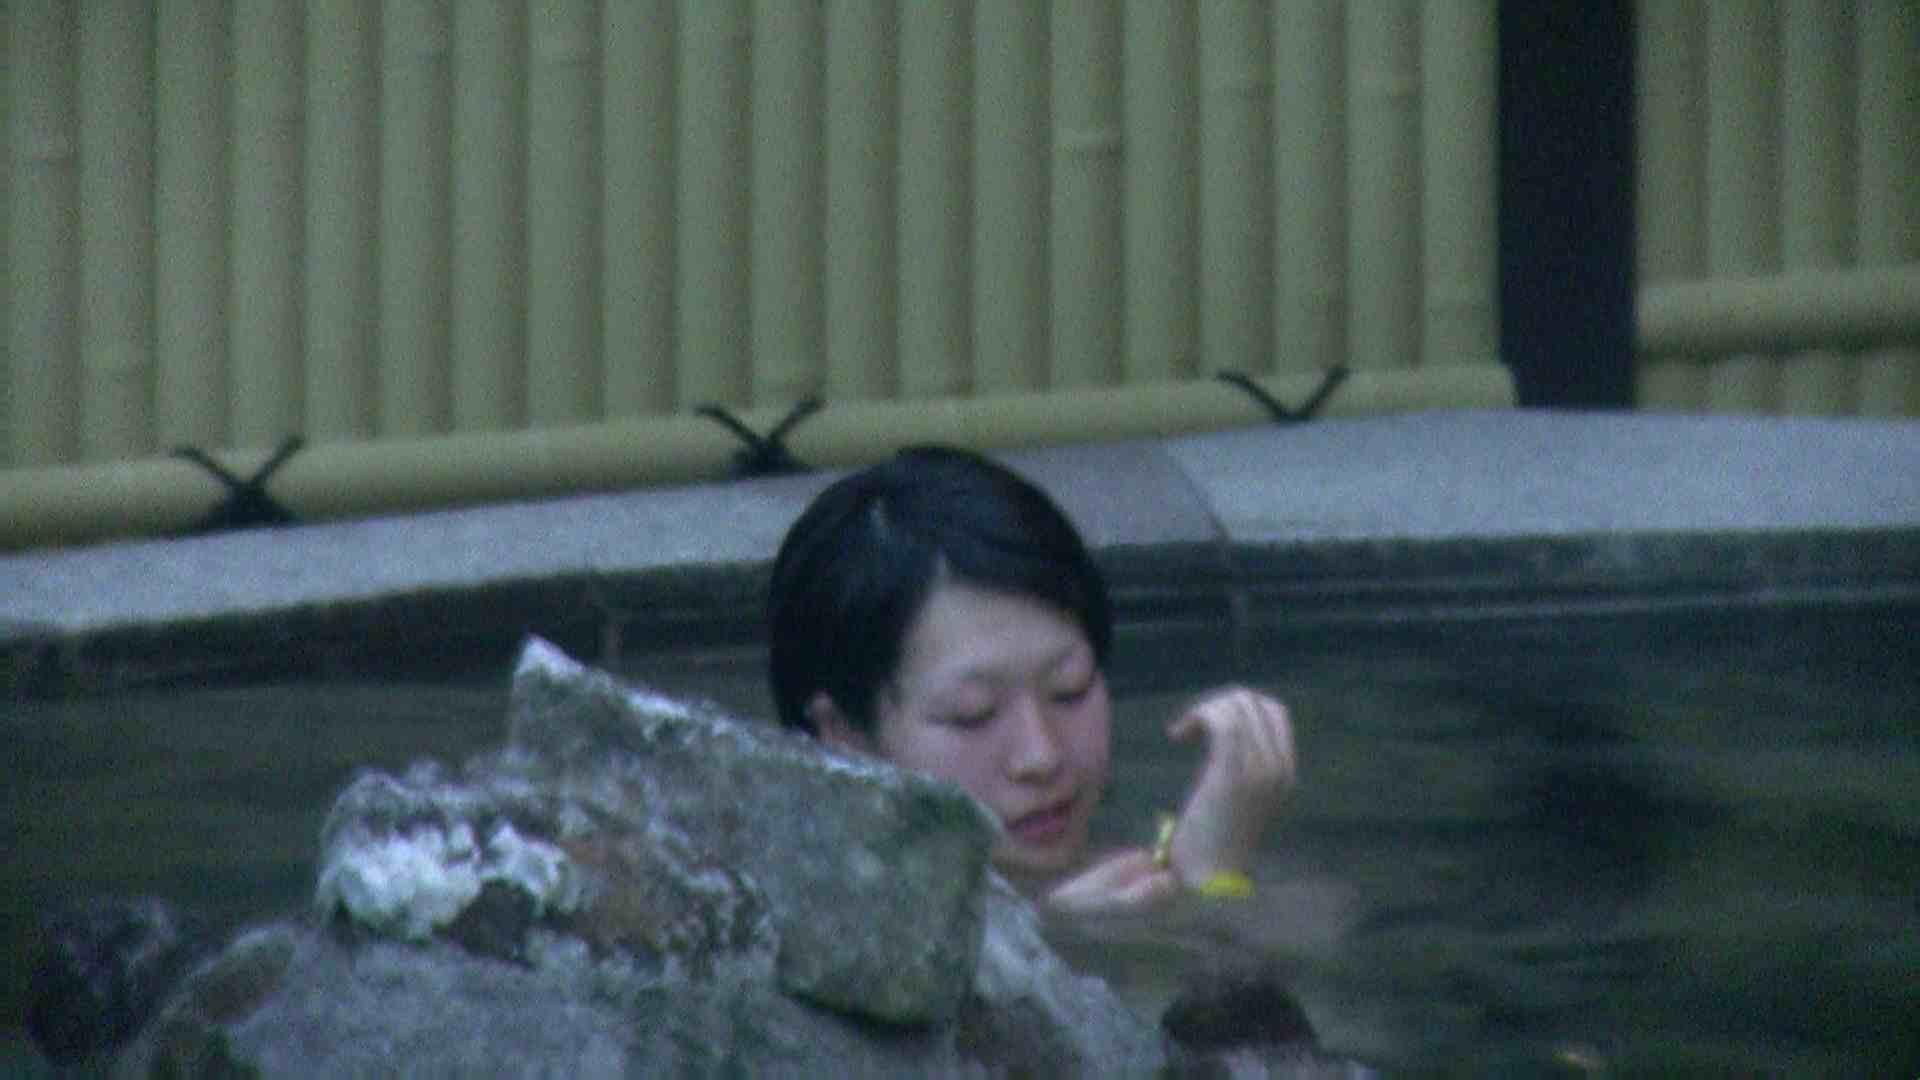 Aquaな露天風呂Vol.05【VIP】 綺麗なOLたち | 盗撮  63枚 4